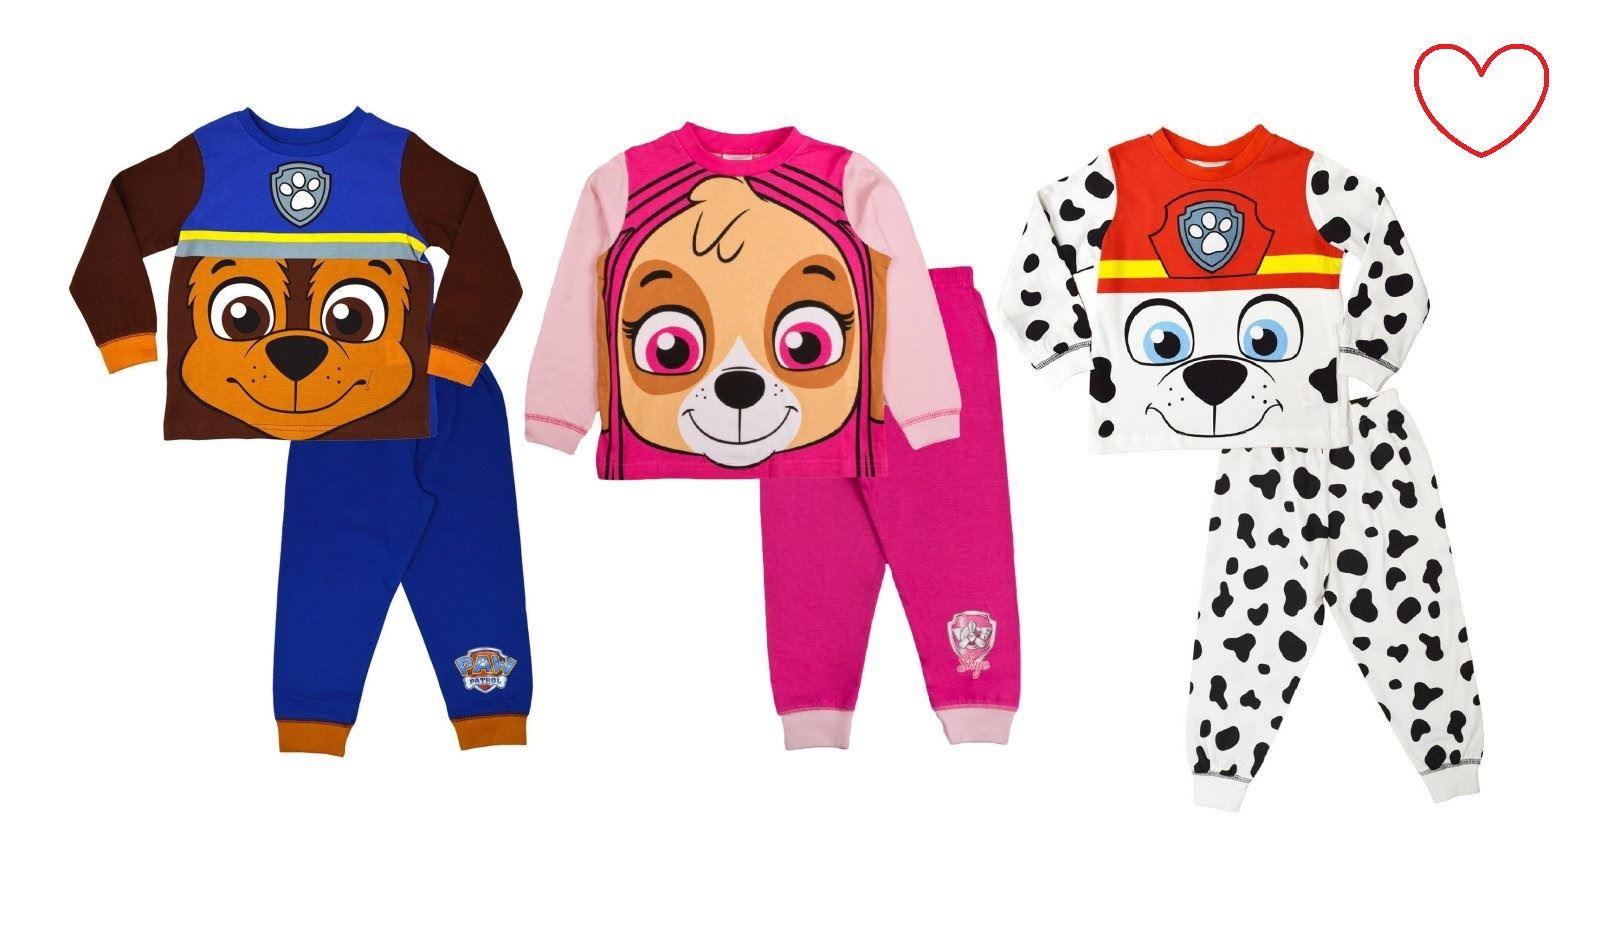 c919b0b9b062 Paw Patrol Boys Girls Pyjamas Toddler Character Kids